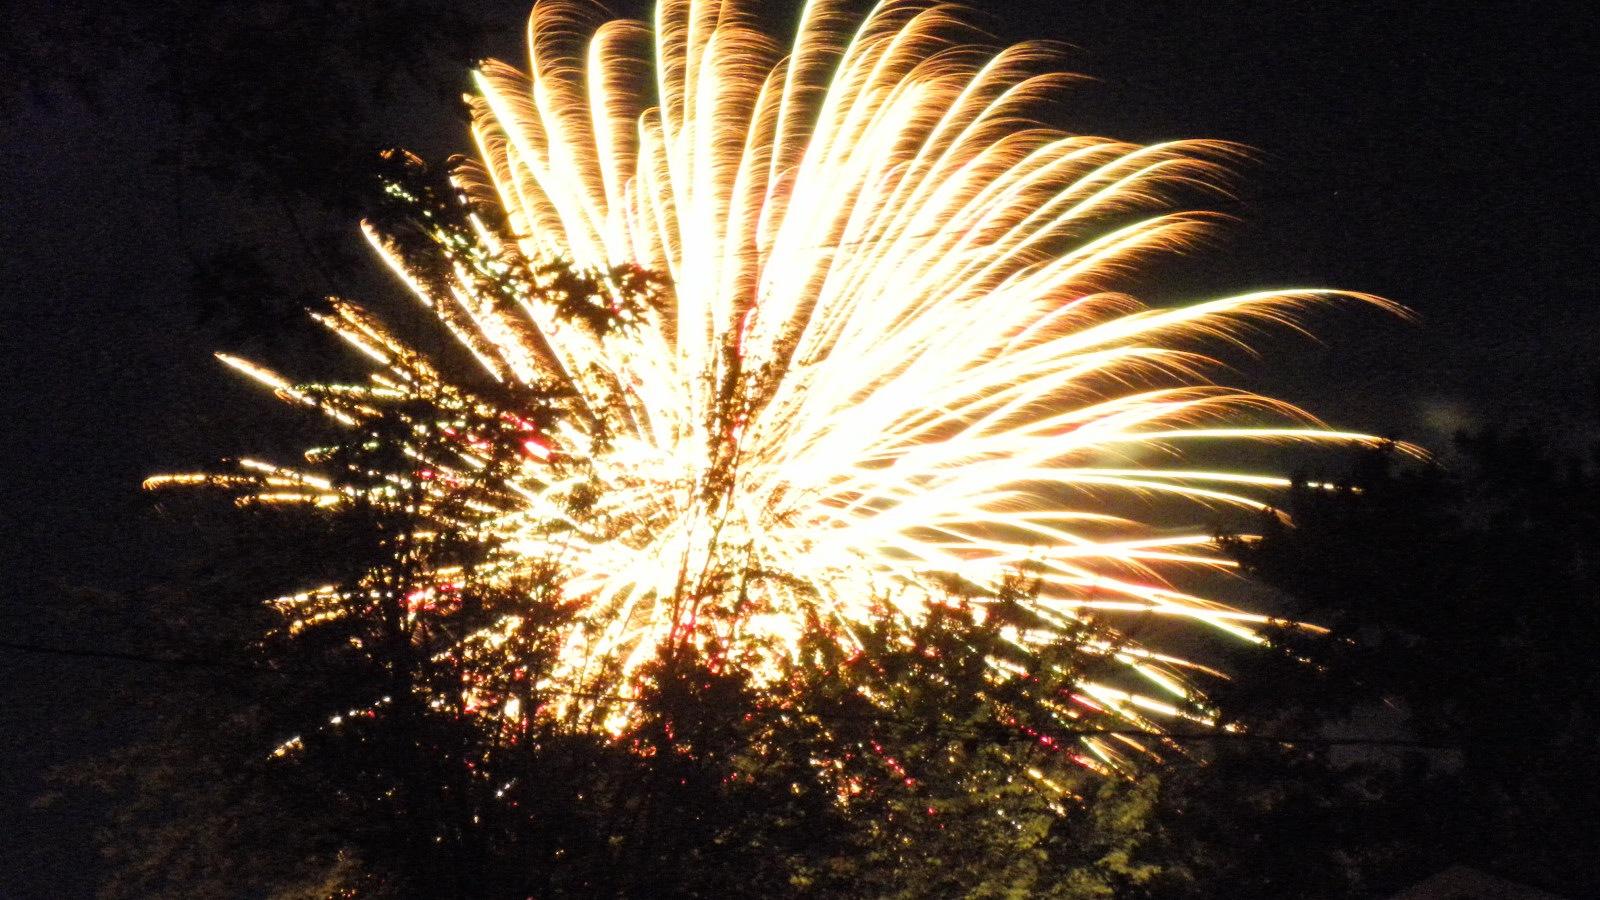 [Fireworks%2520Neighborhood%2520July%25202%252011%2520%25287%2529compressed%255B2%255D.jpg]